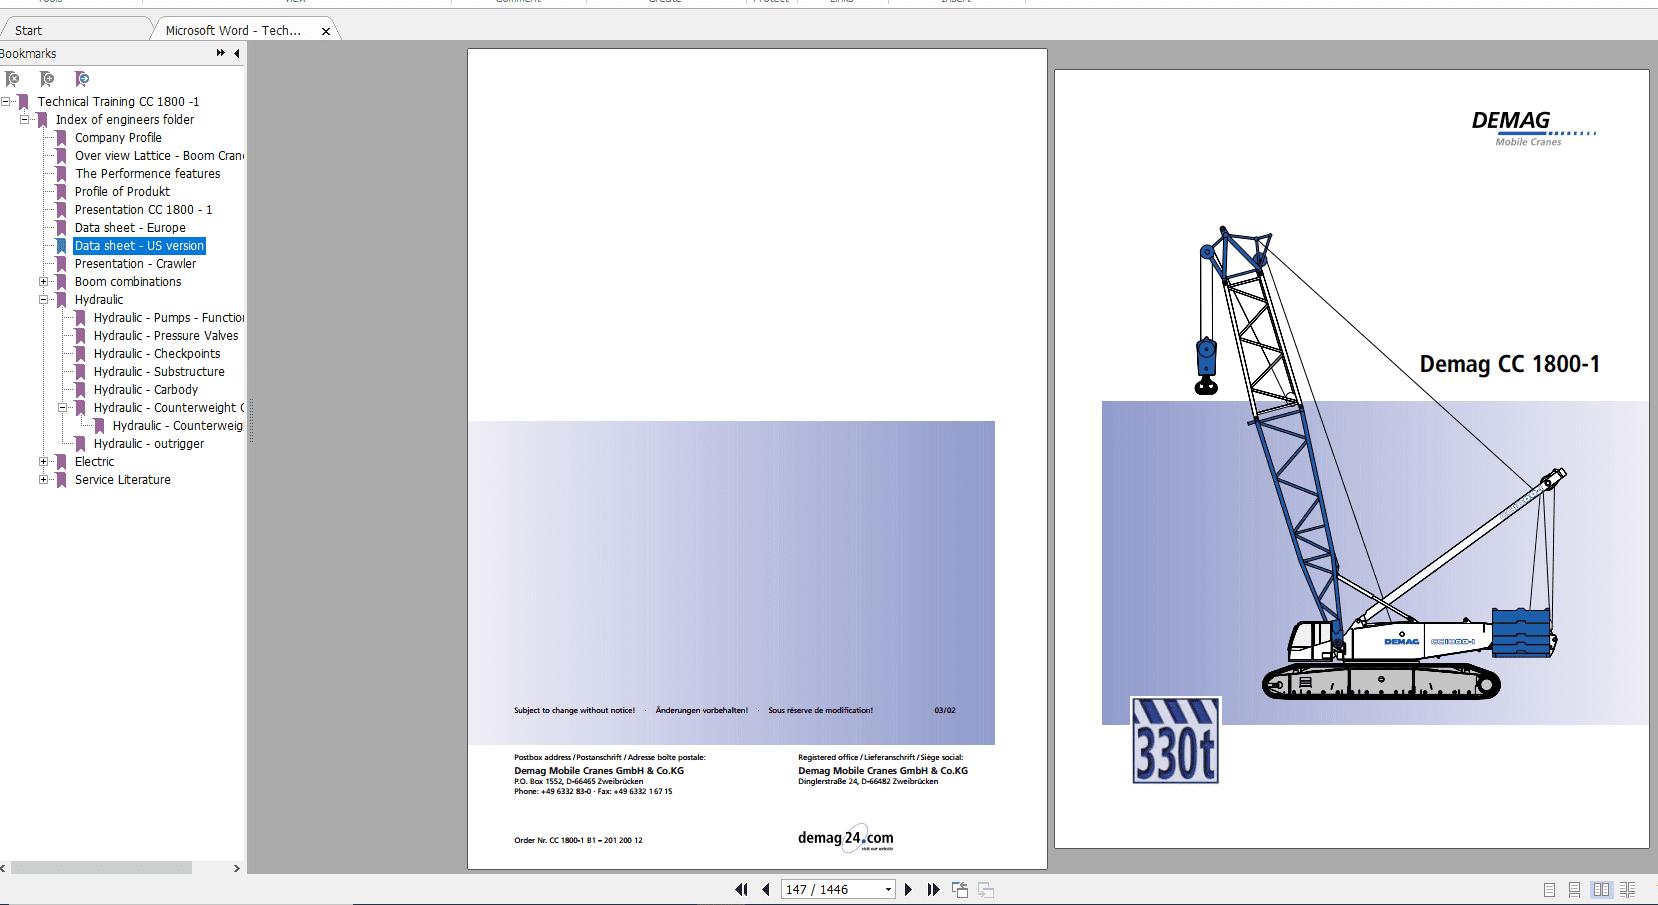 Terex_Demag_CC_1800-1_Crawler_Crane_Technical_Manual_2